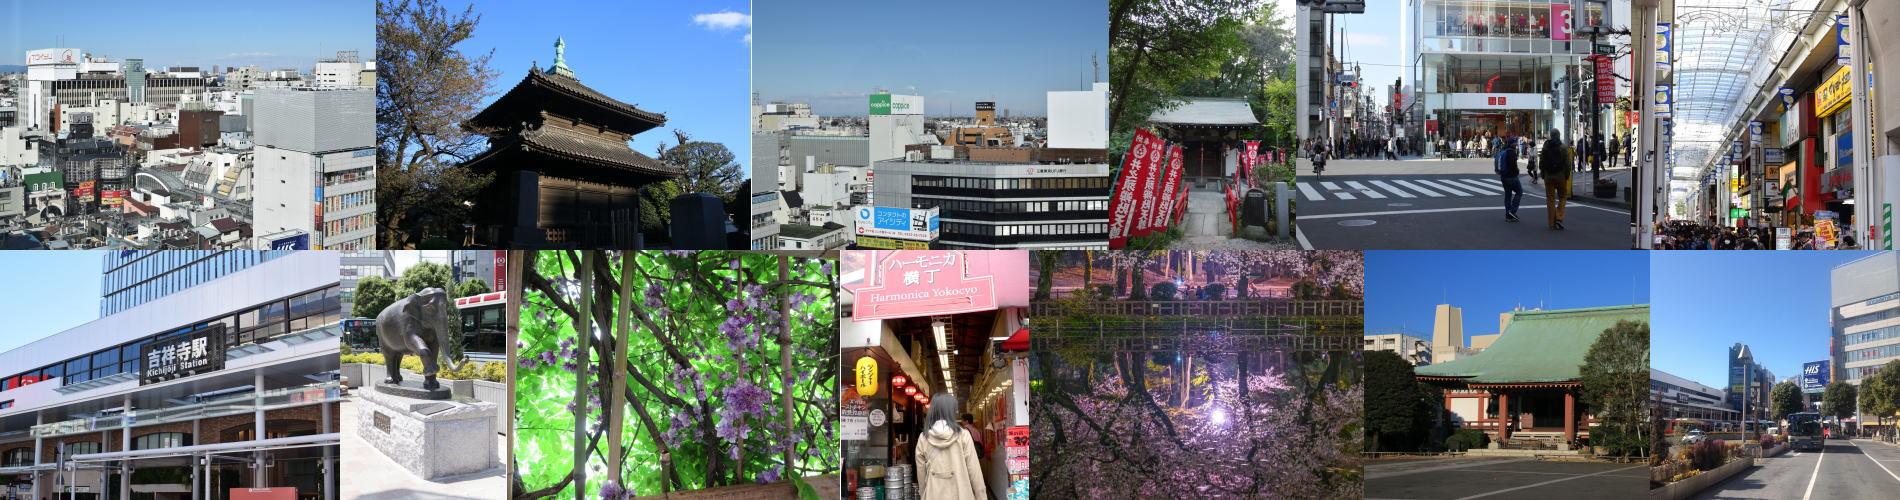 武蔵野の風景